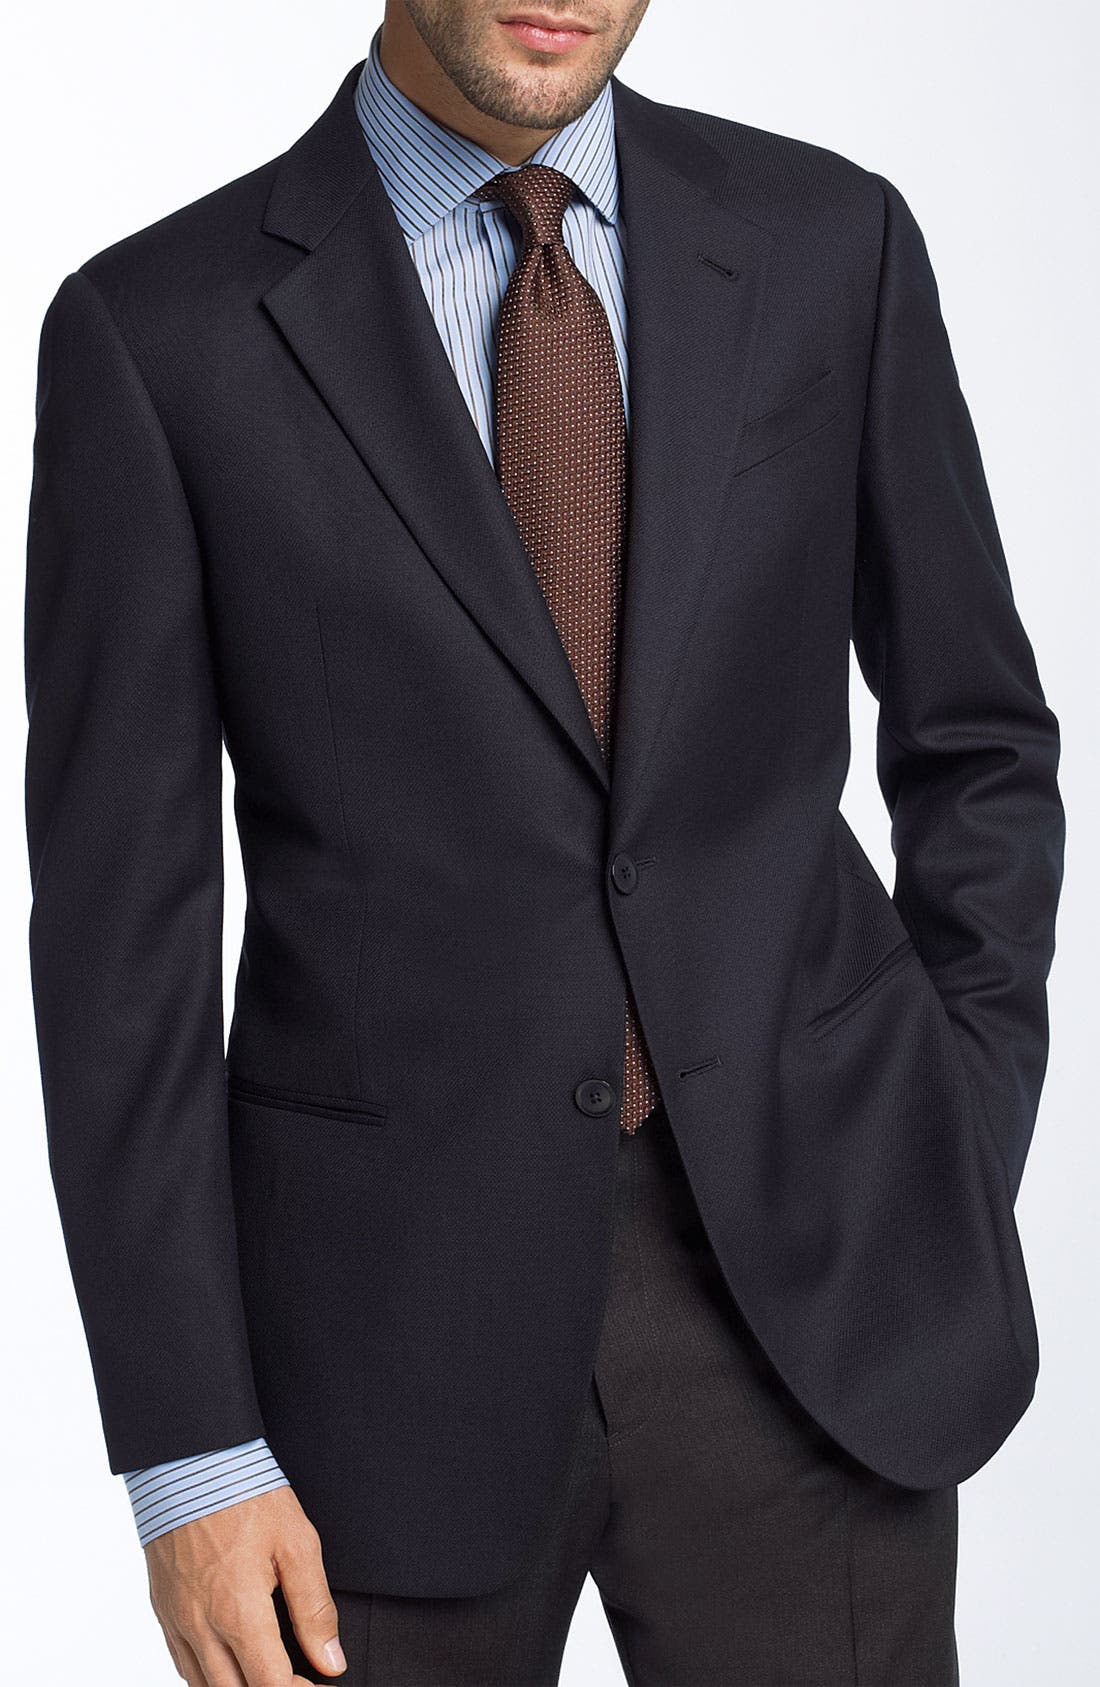 Main Image - Armani Collezioni Trim Fit Wool Blazer